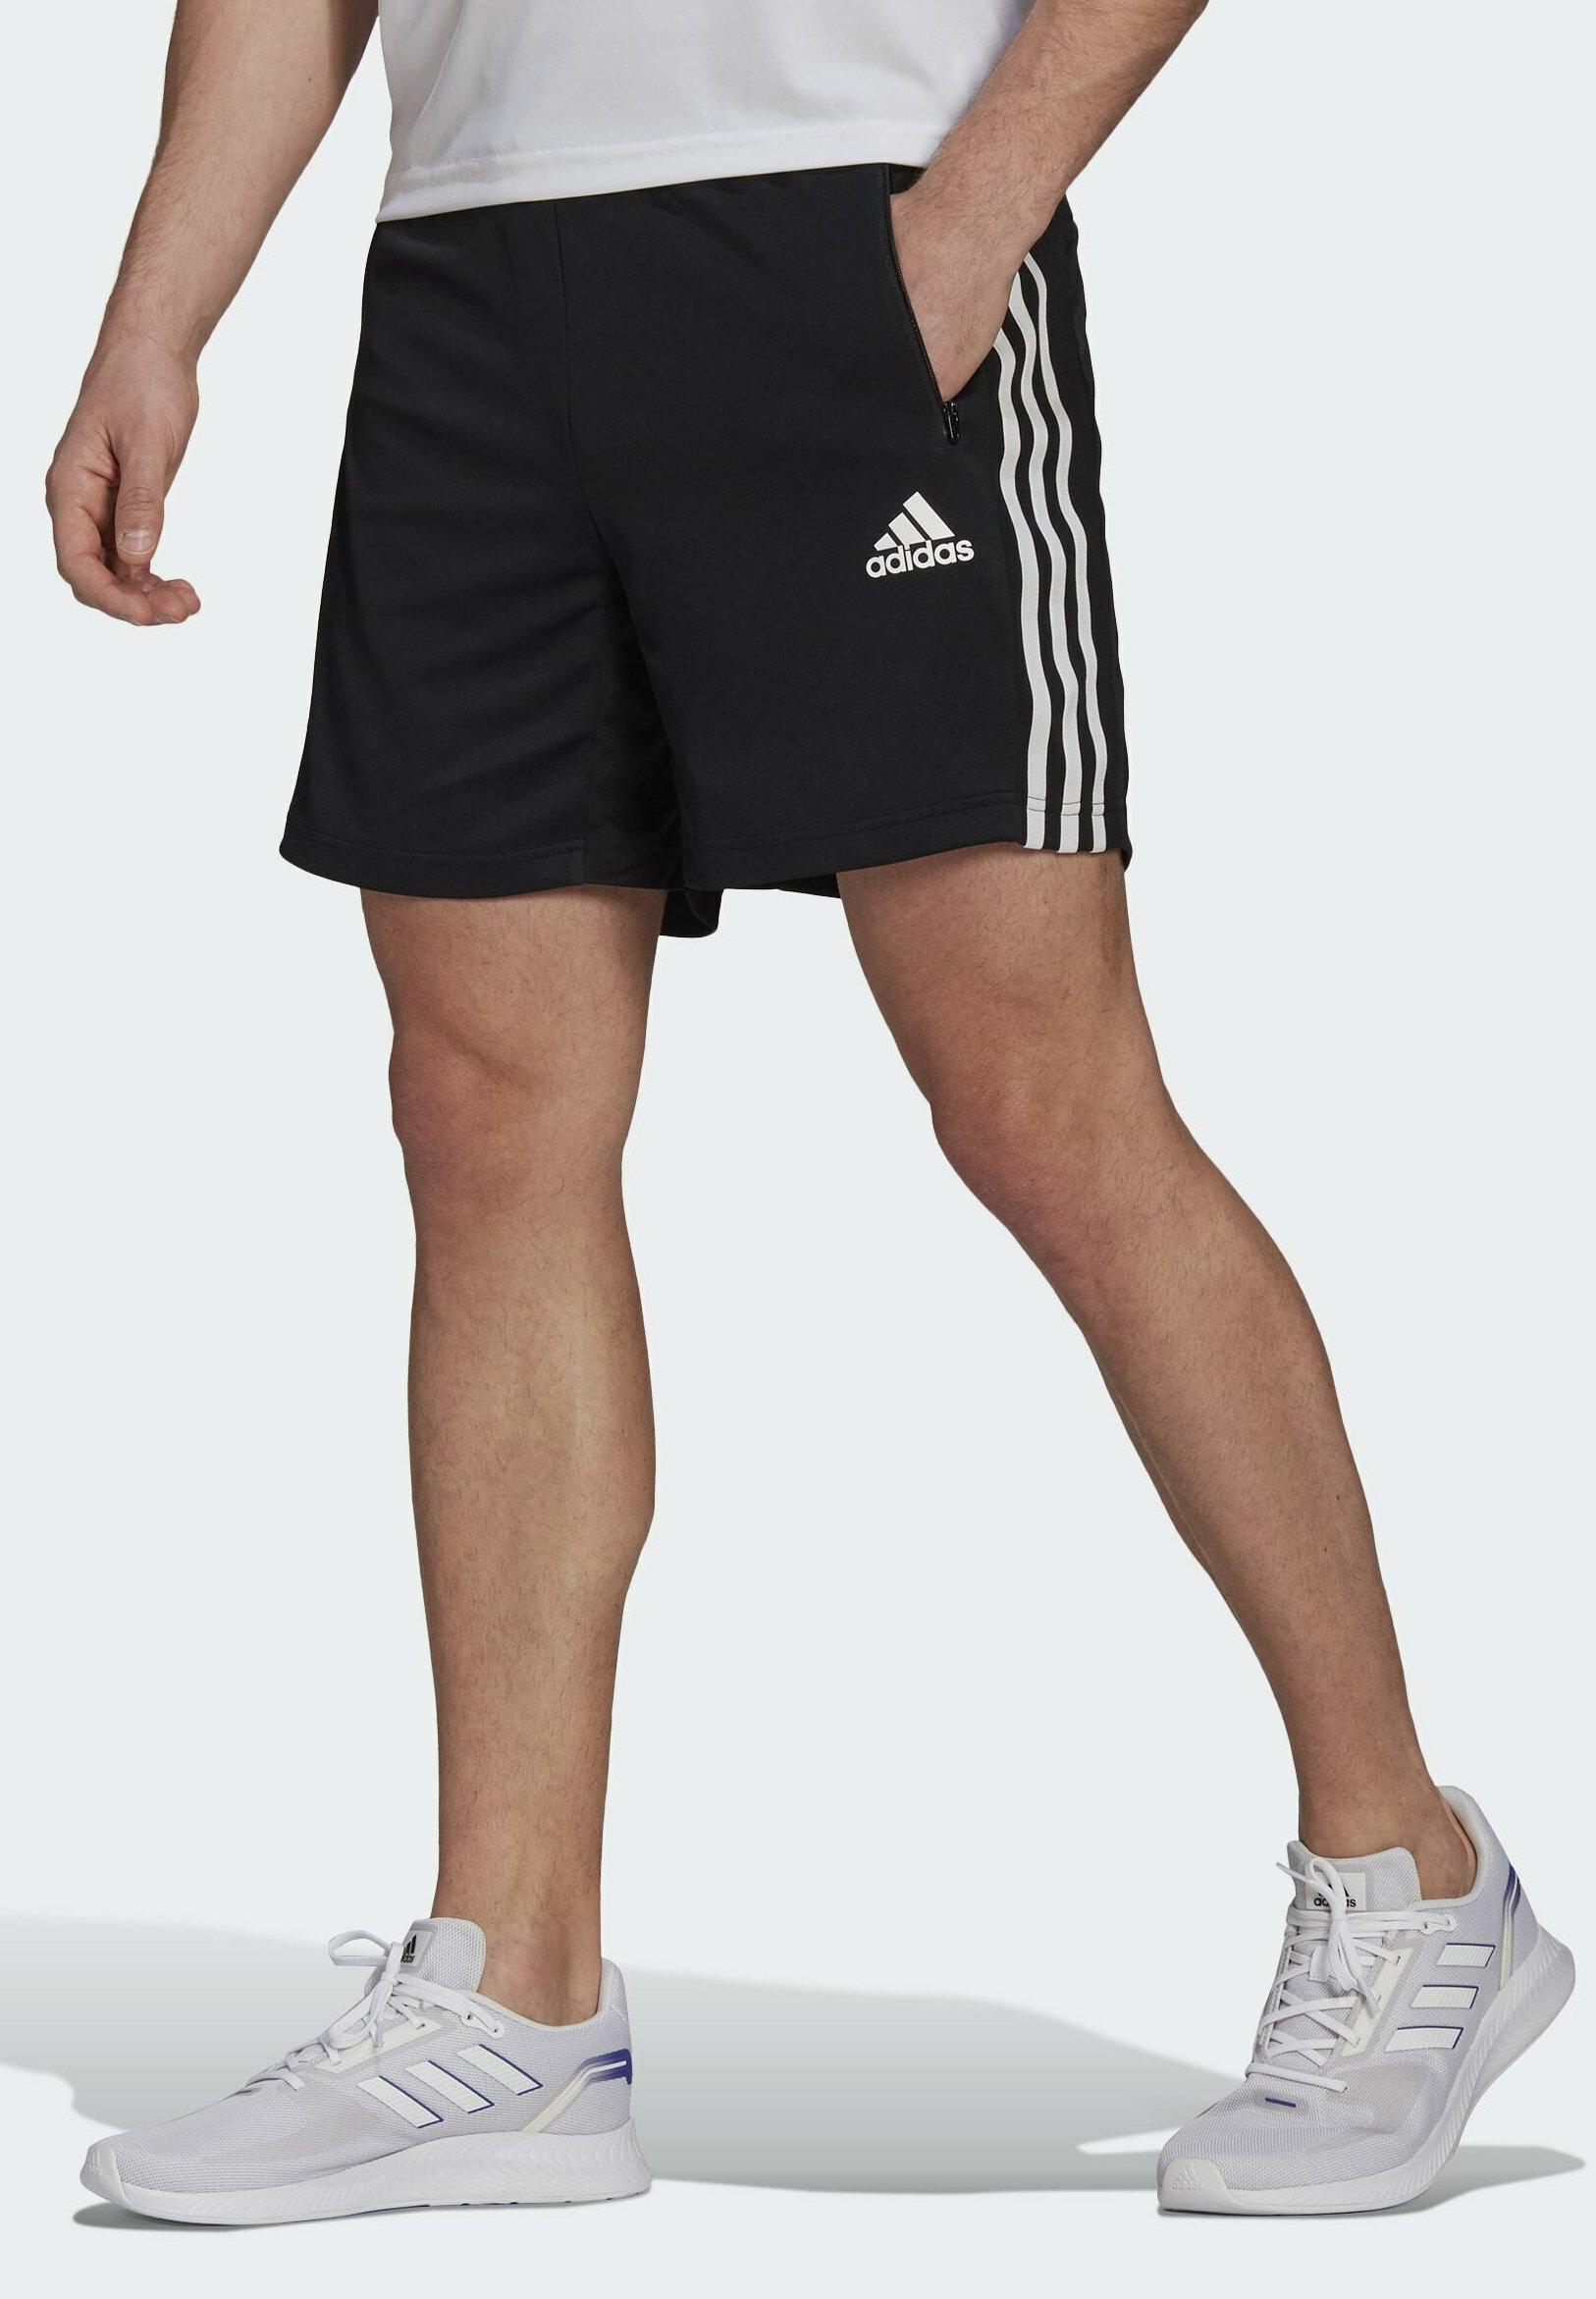 Men PRIMEBLUE DESIGNED TO MOVE SPORT 3-STRIPES SHORTS - Sports shorts